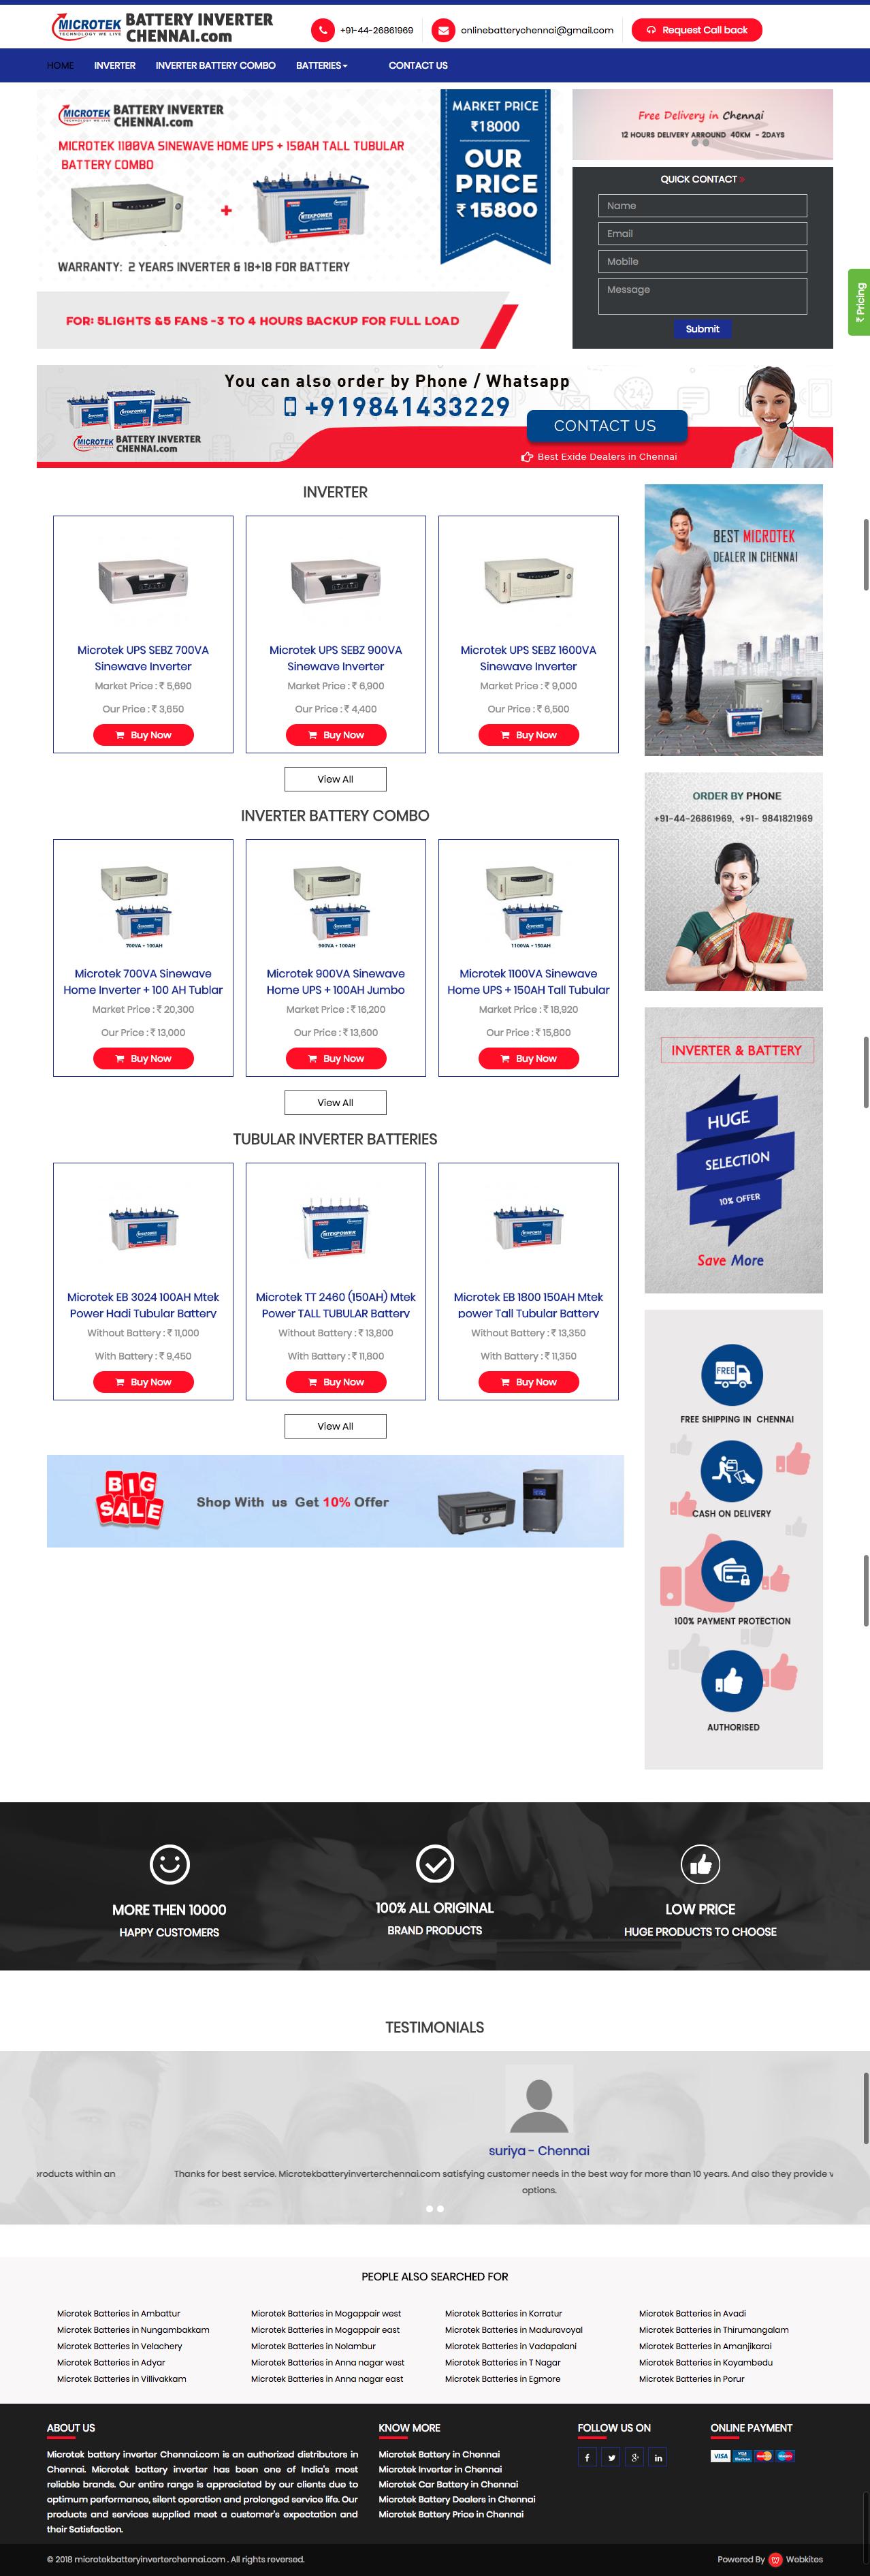 Dynamic websites for Microtekbatteryinverterchennai